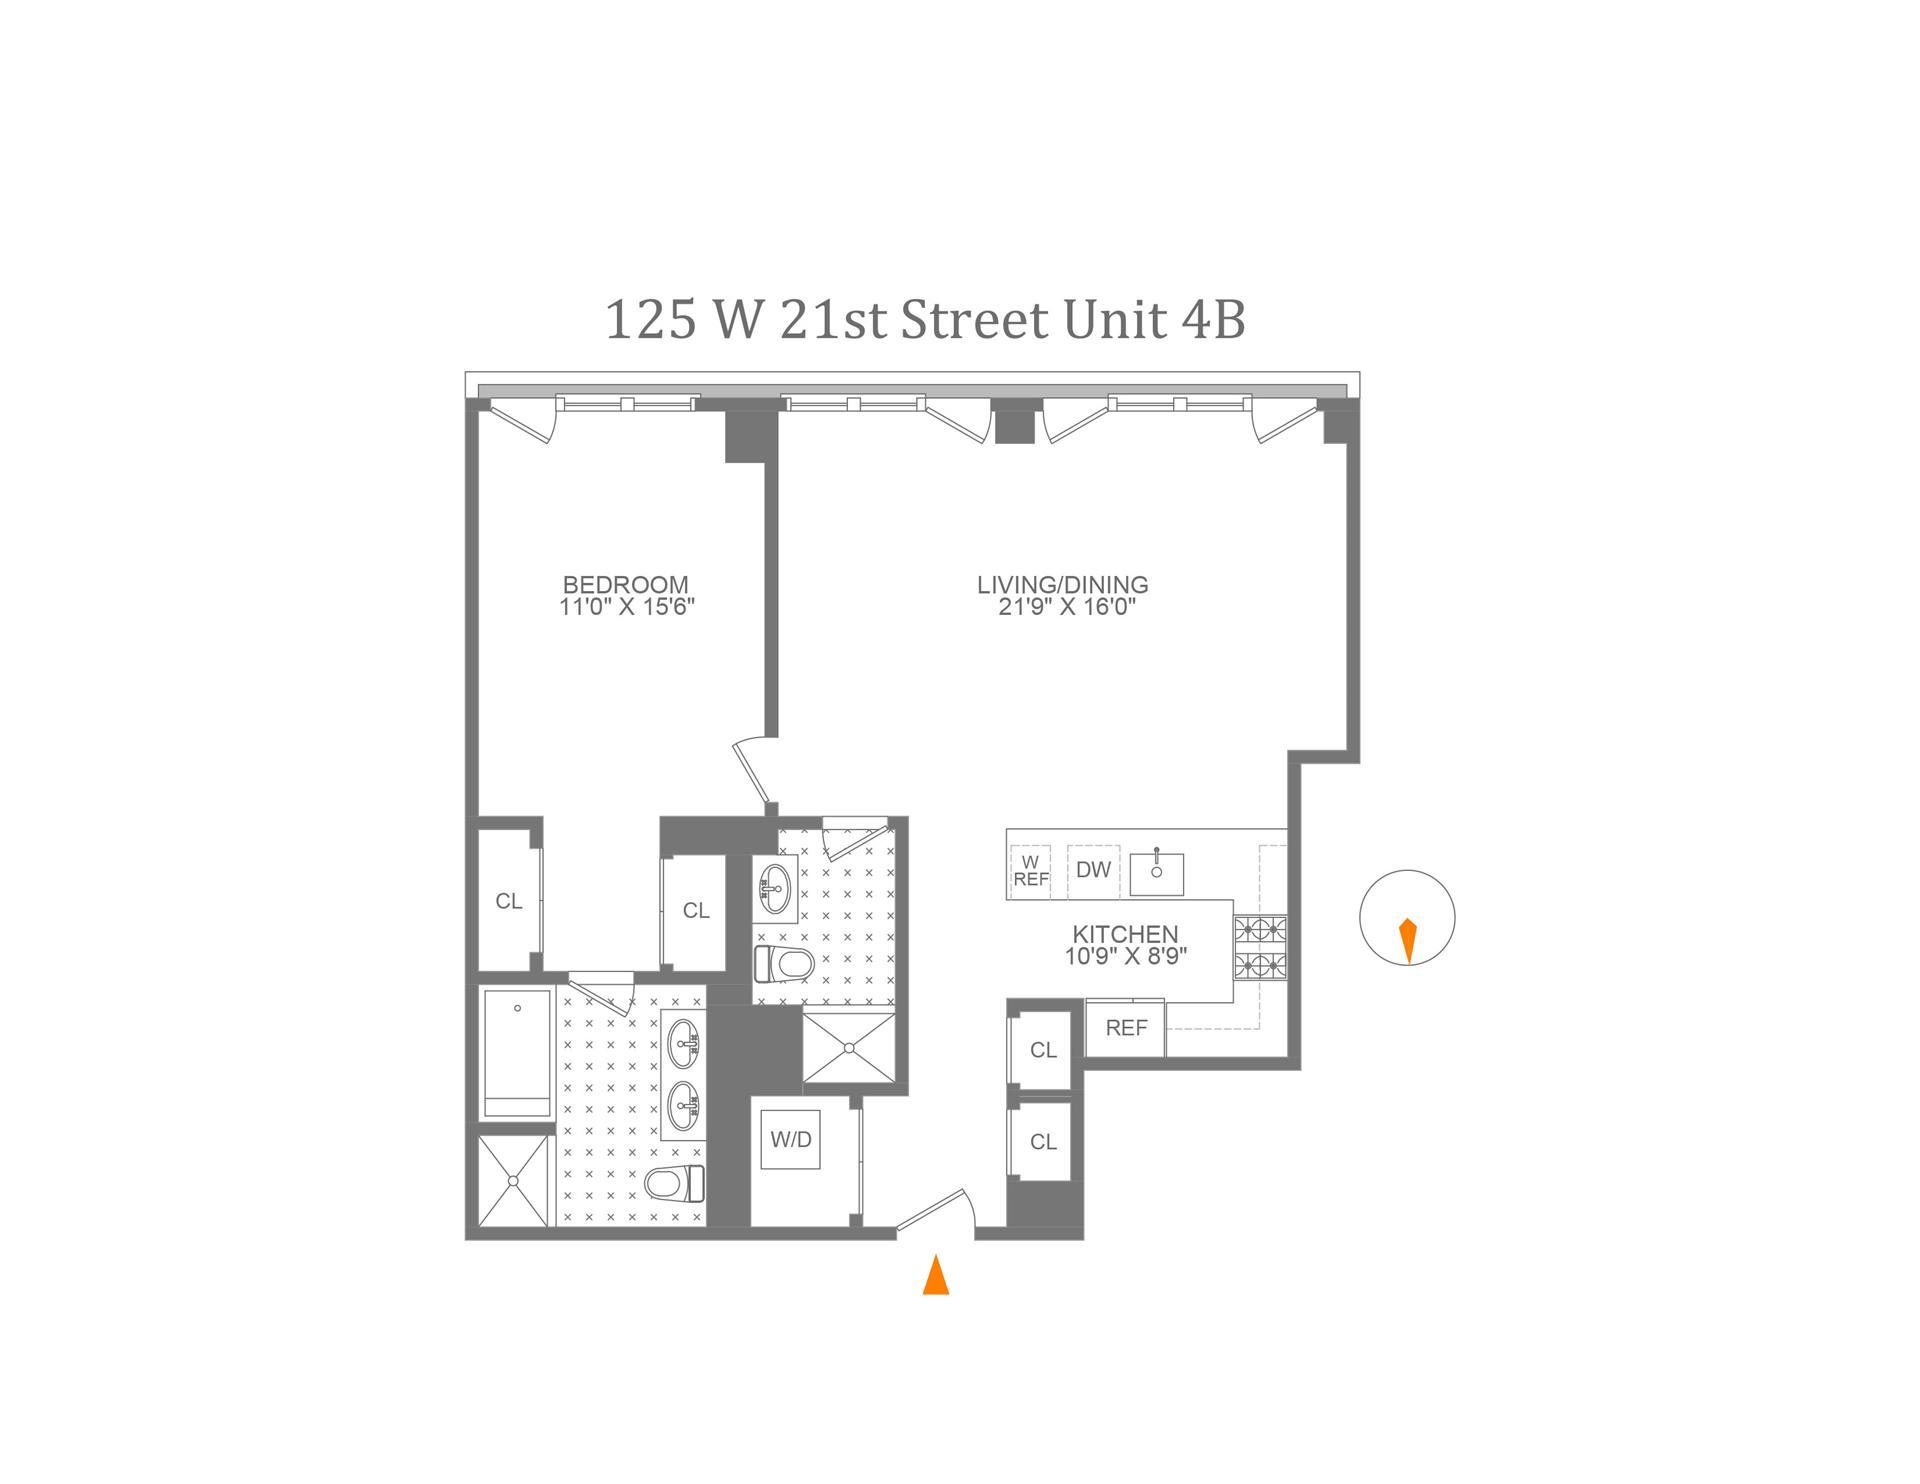 Floor plan of The Indigo Condominium, 125 West 21st Street, 4B - Chelsea, New York